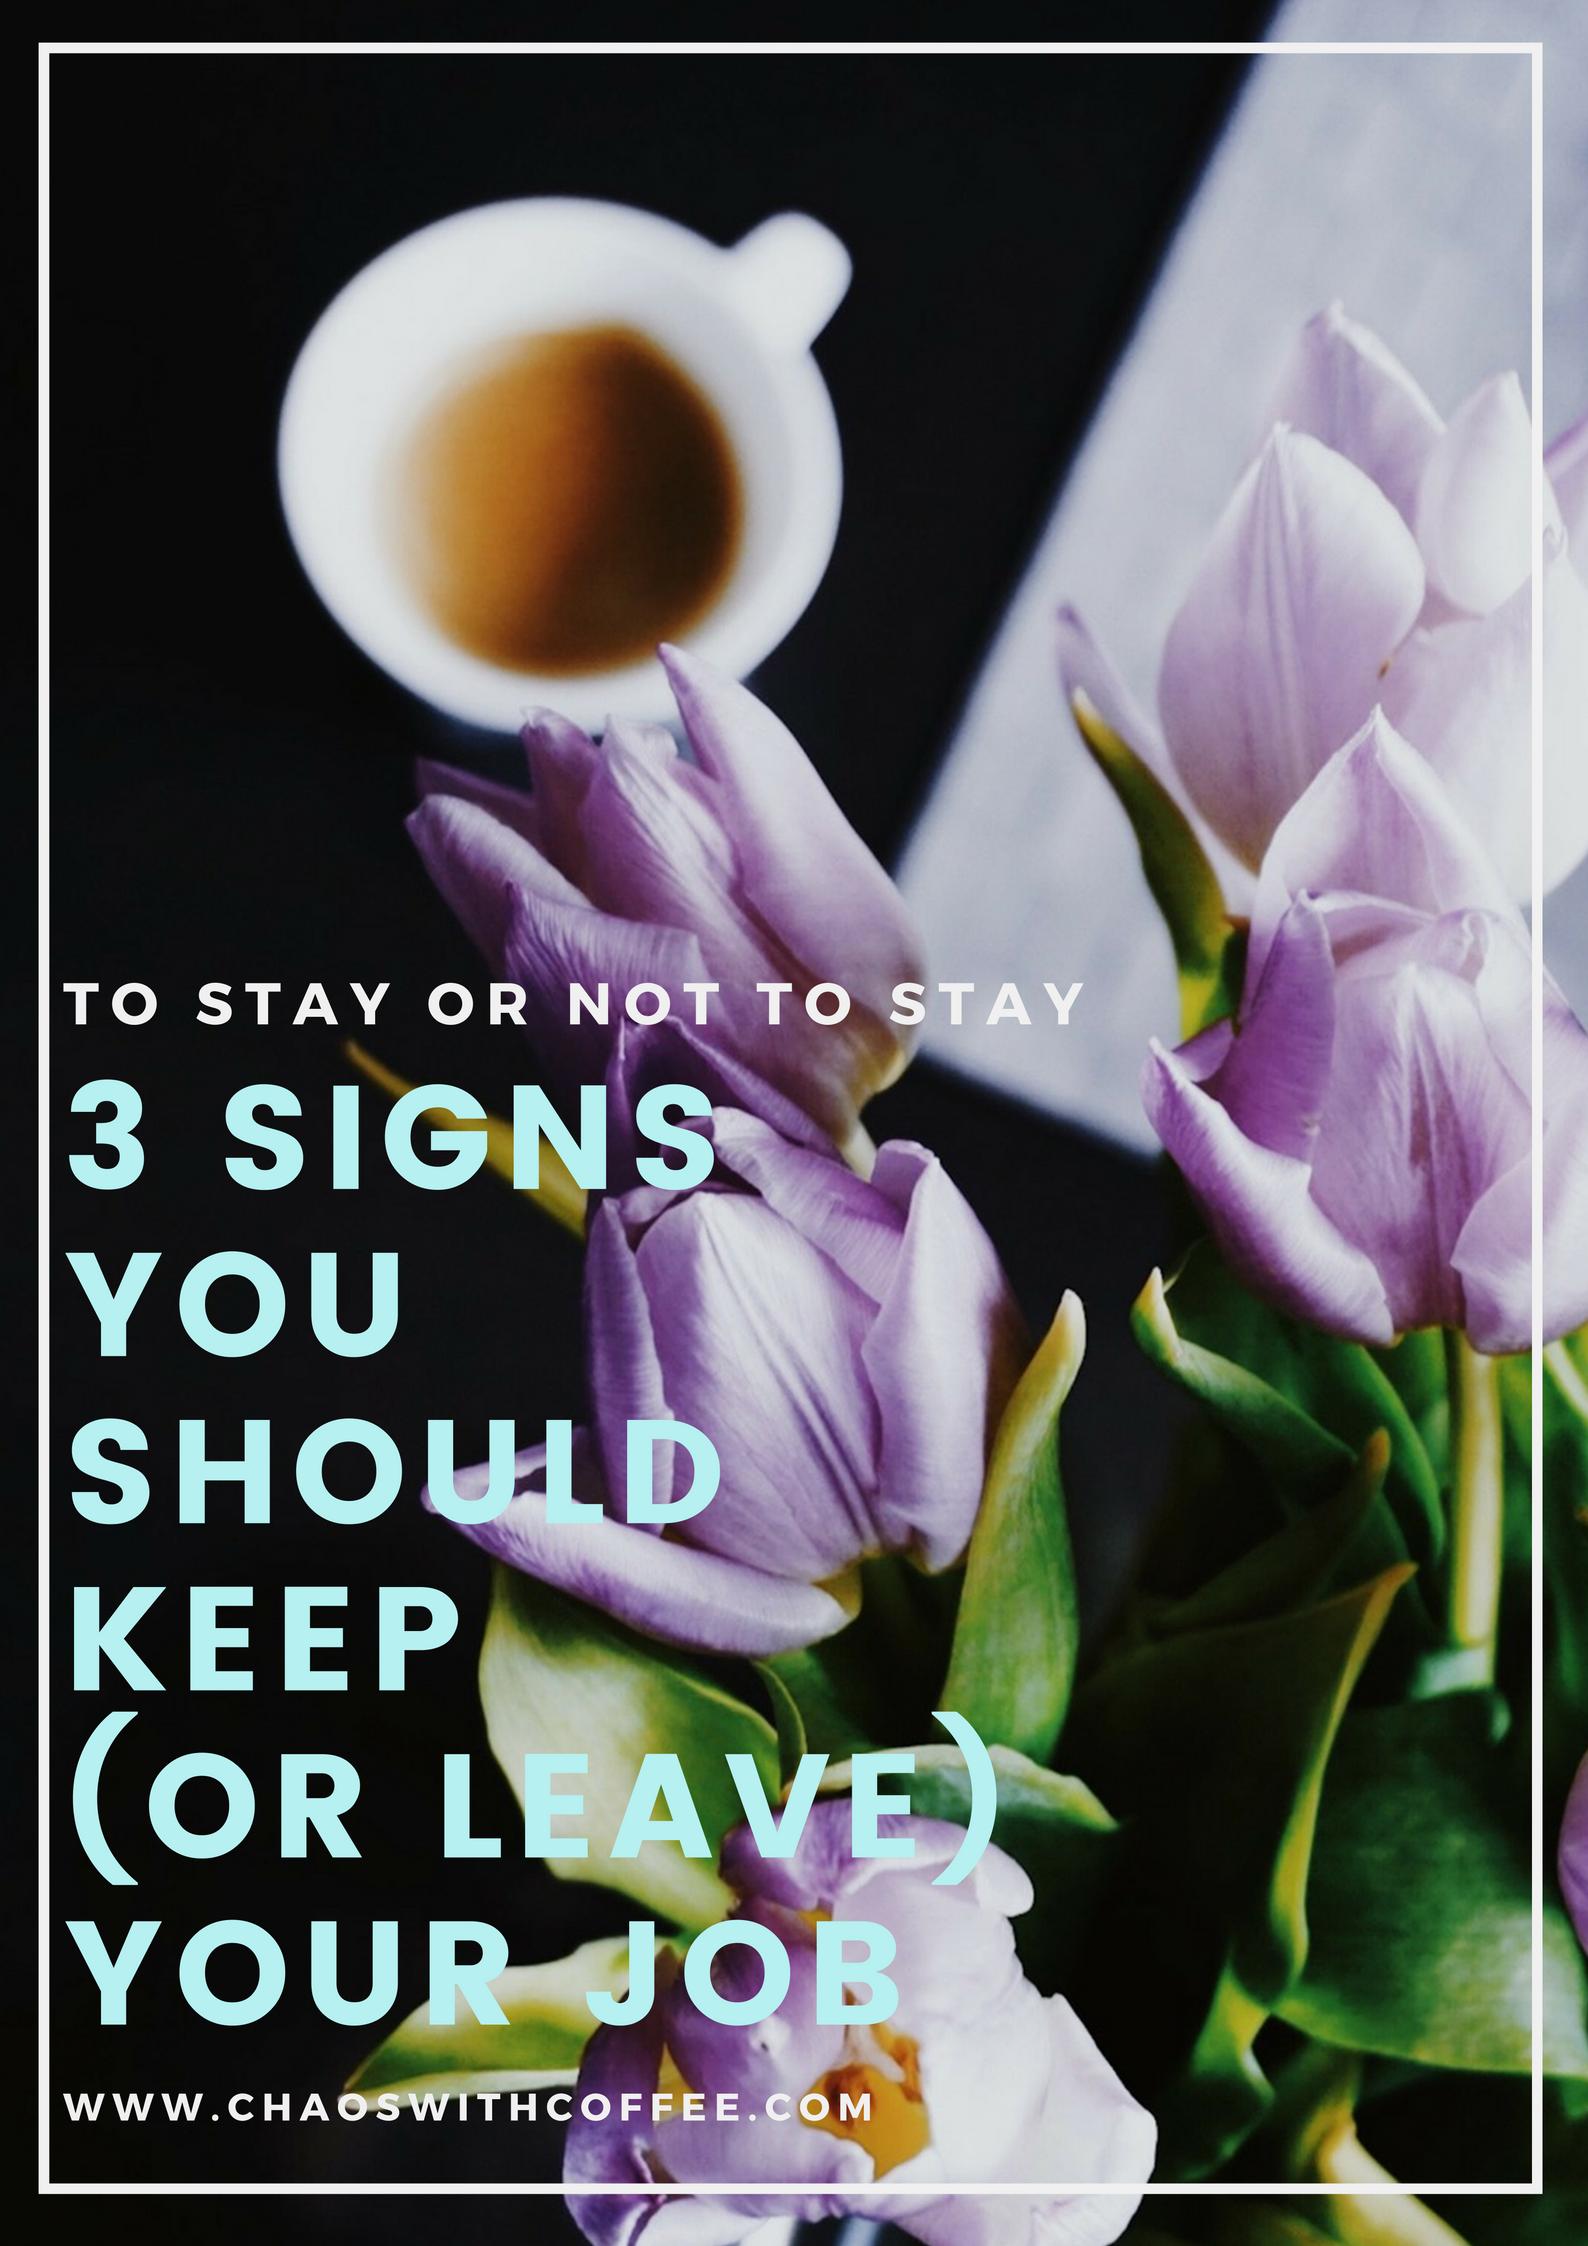 Keep or Leave?